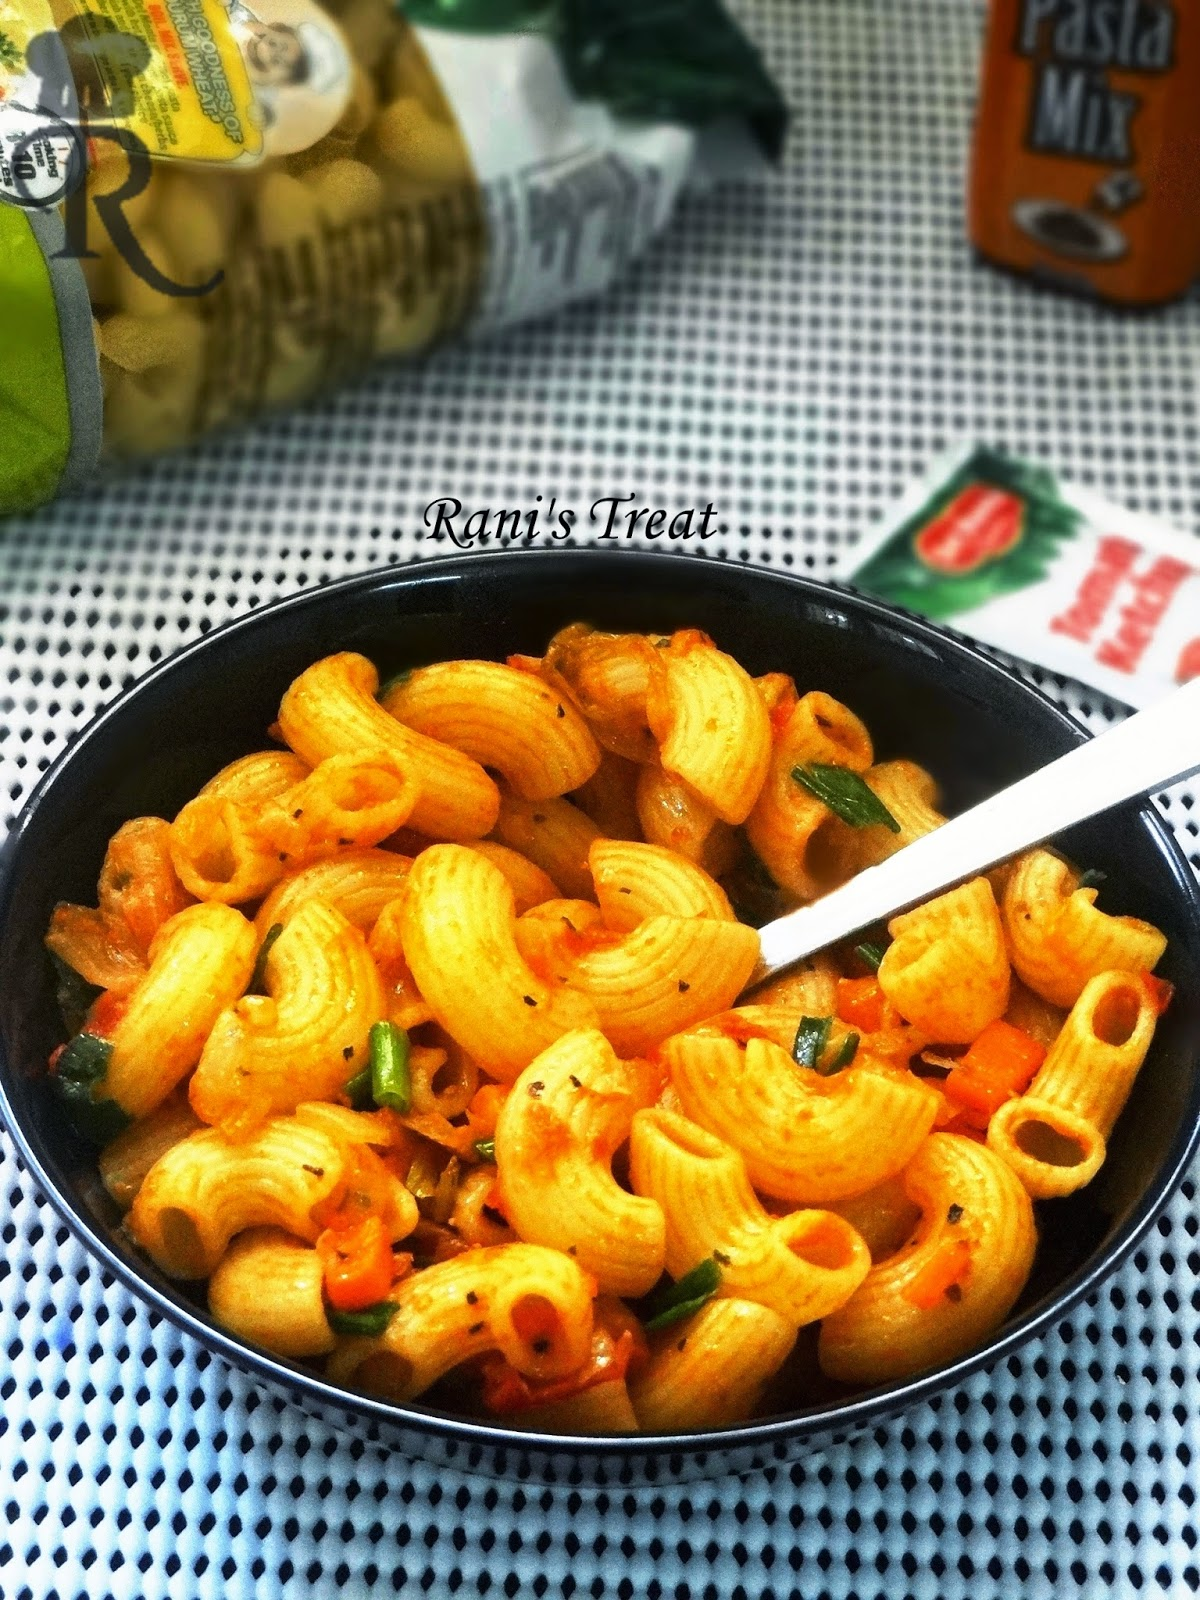 Ranis treat indian style pasta quick pasta easy masala pasta indian style pasta quick pasta easy masala pasta forumfinder Image collections